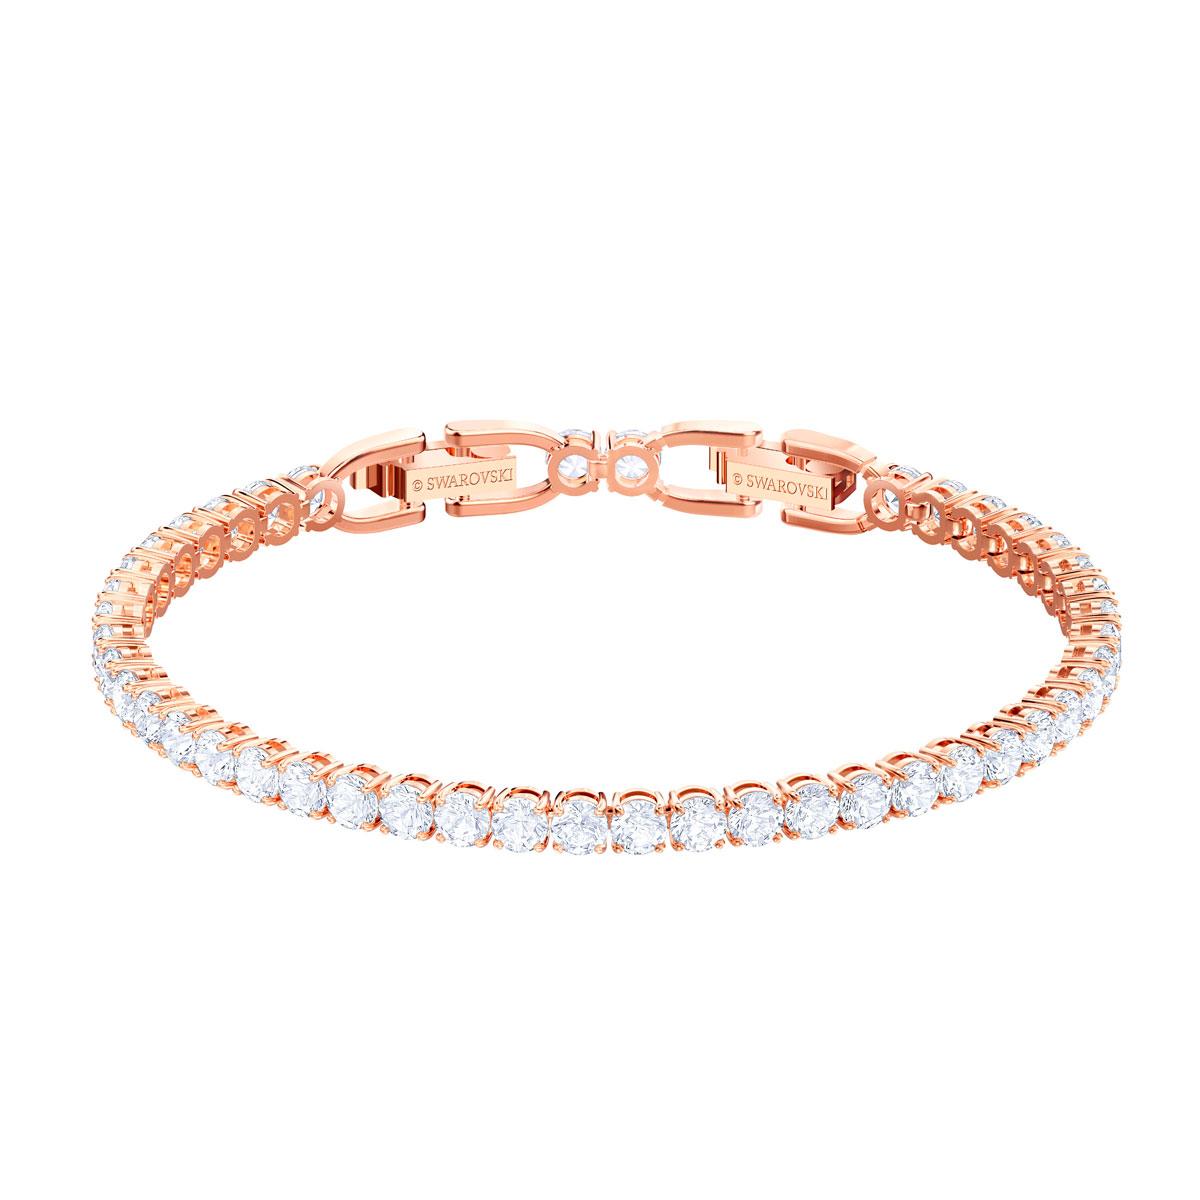 Swarovski Tennis Bracelet, White, Rose Gold